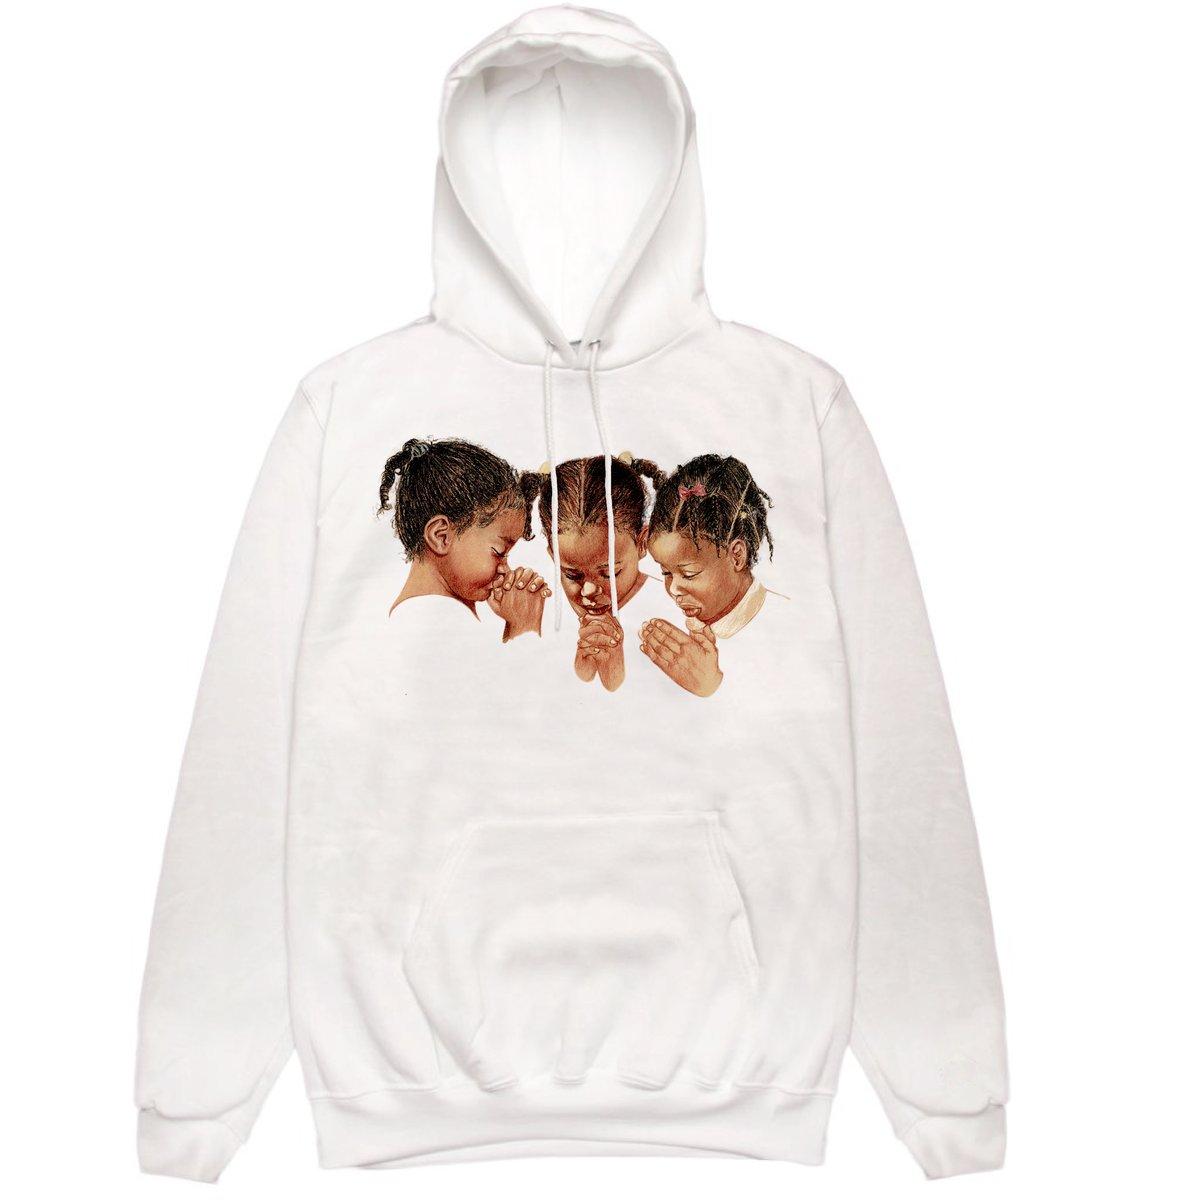 Image of 3girls White Hoodie